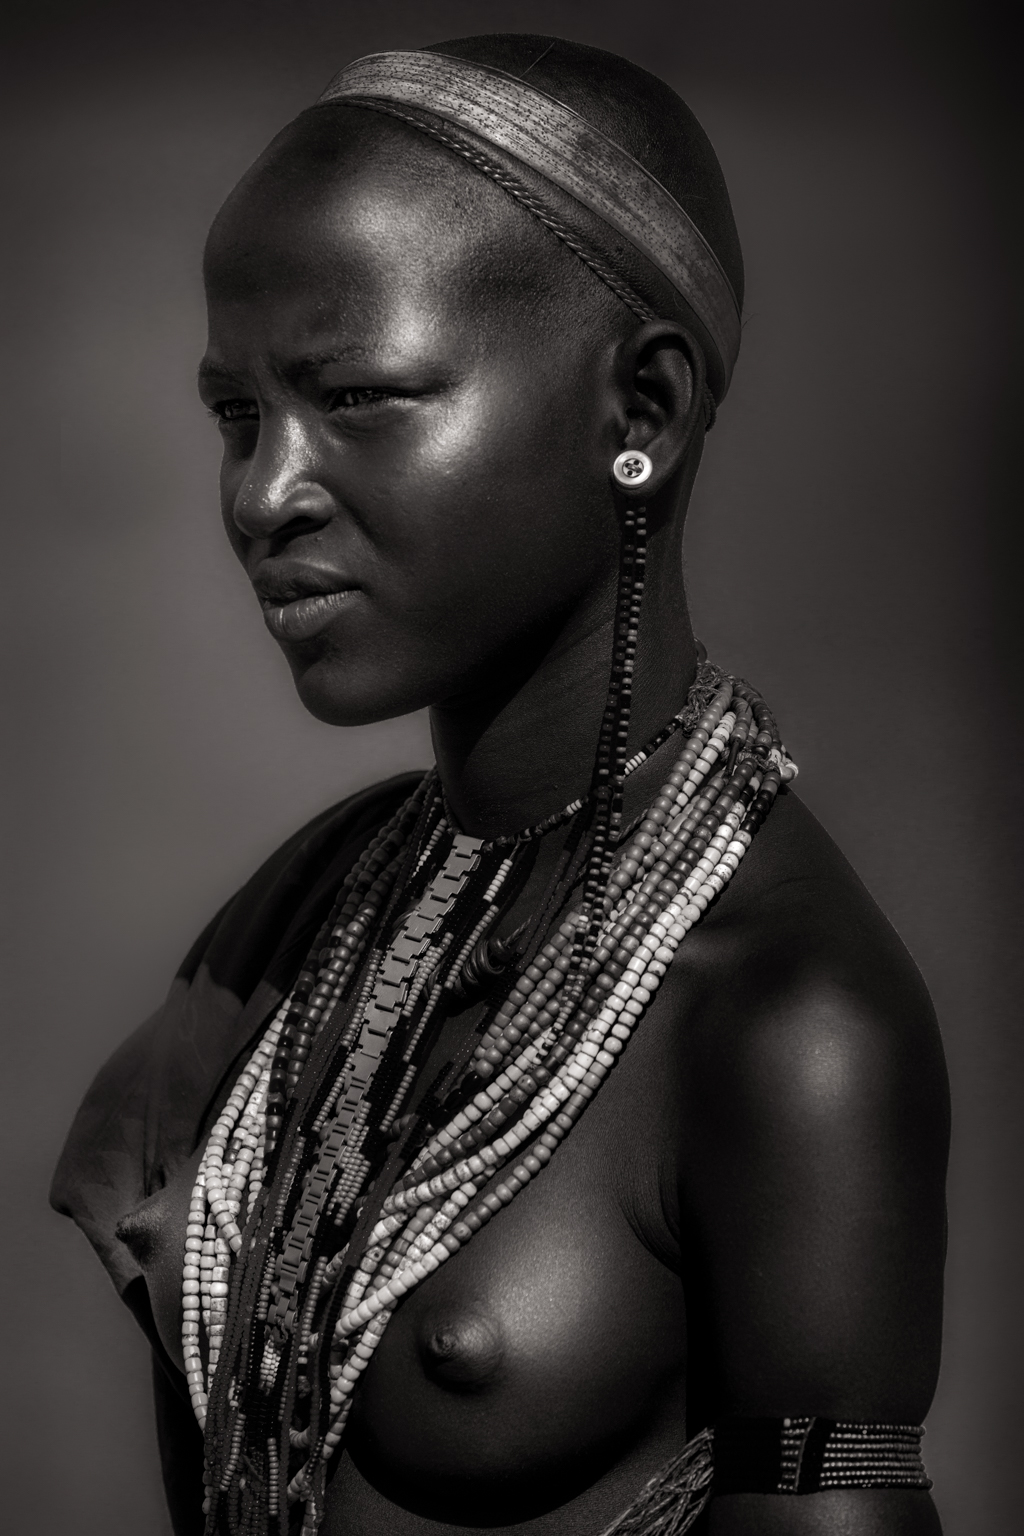 ETHIOPIA: Tribes of the Omo Valley-Mursi, Karo, Hamer & Arbore  Portraits